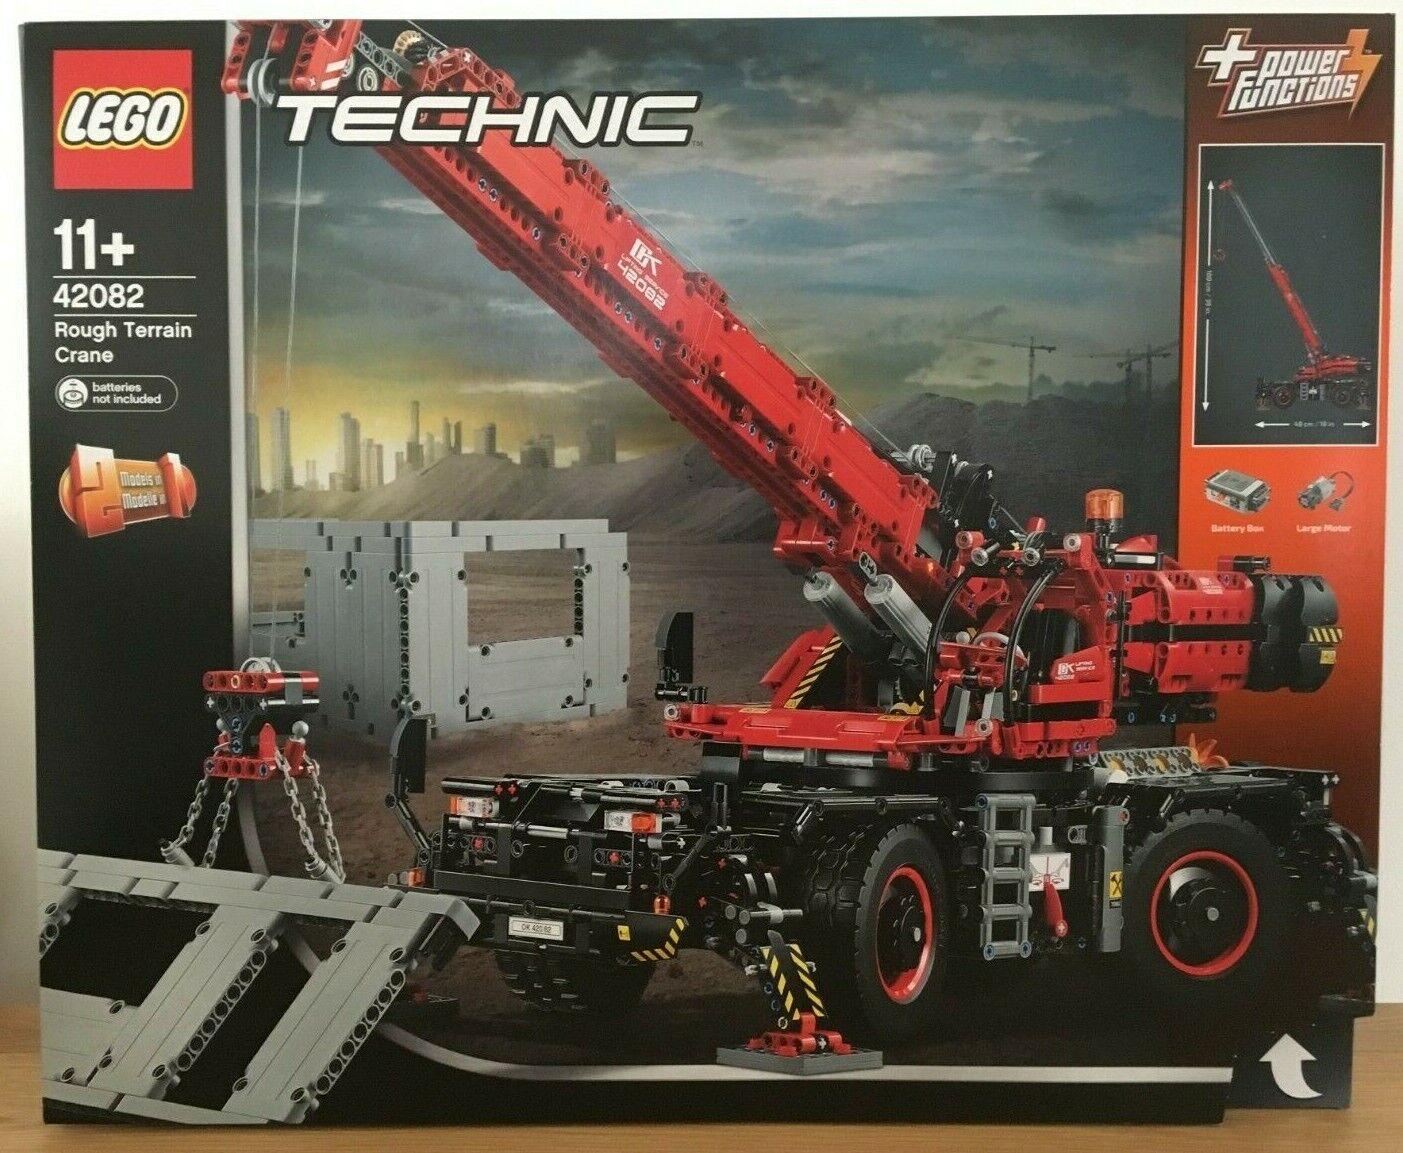 Lego Technic 42082 Rough Terrain Crane Opened Never Oqnisz6129